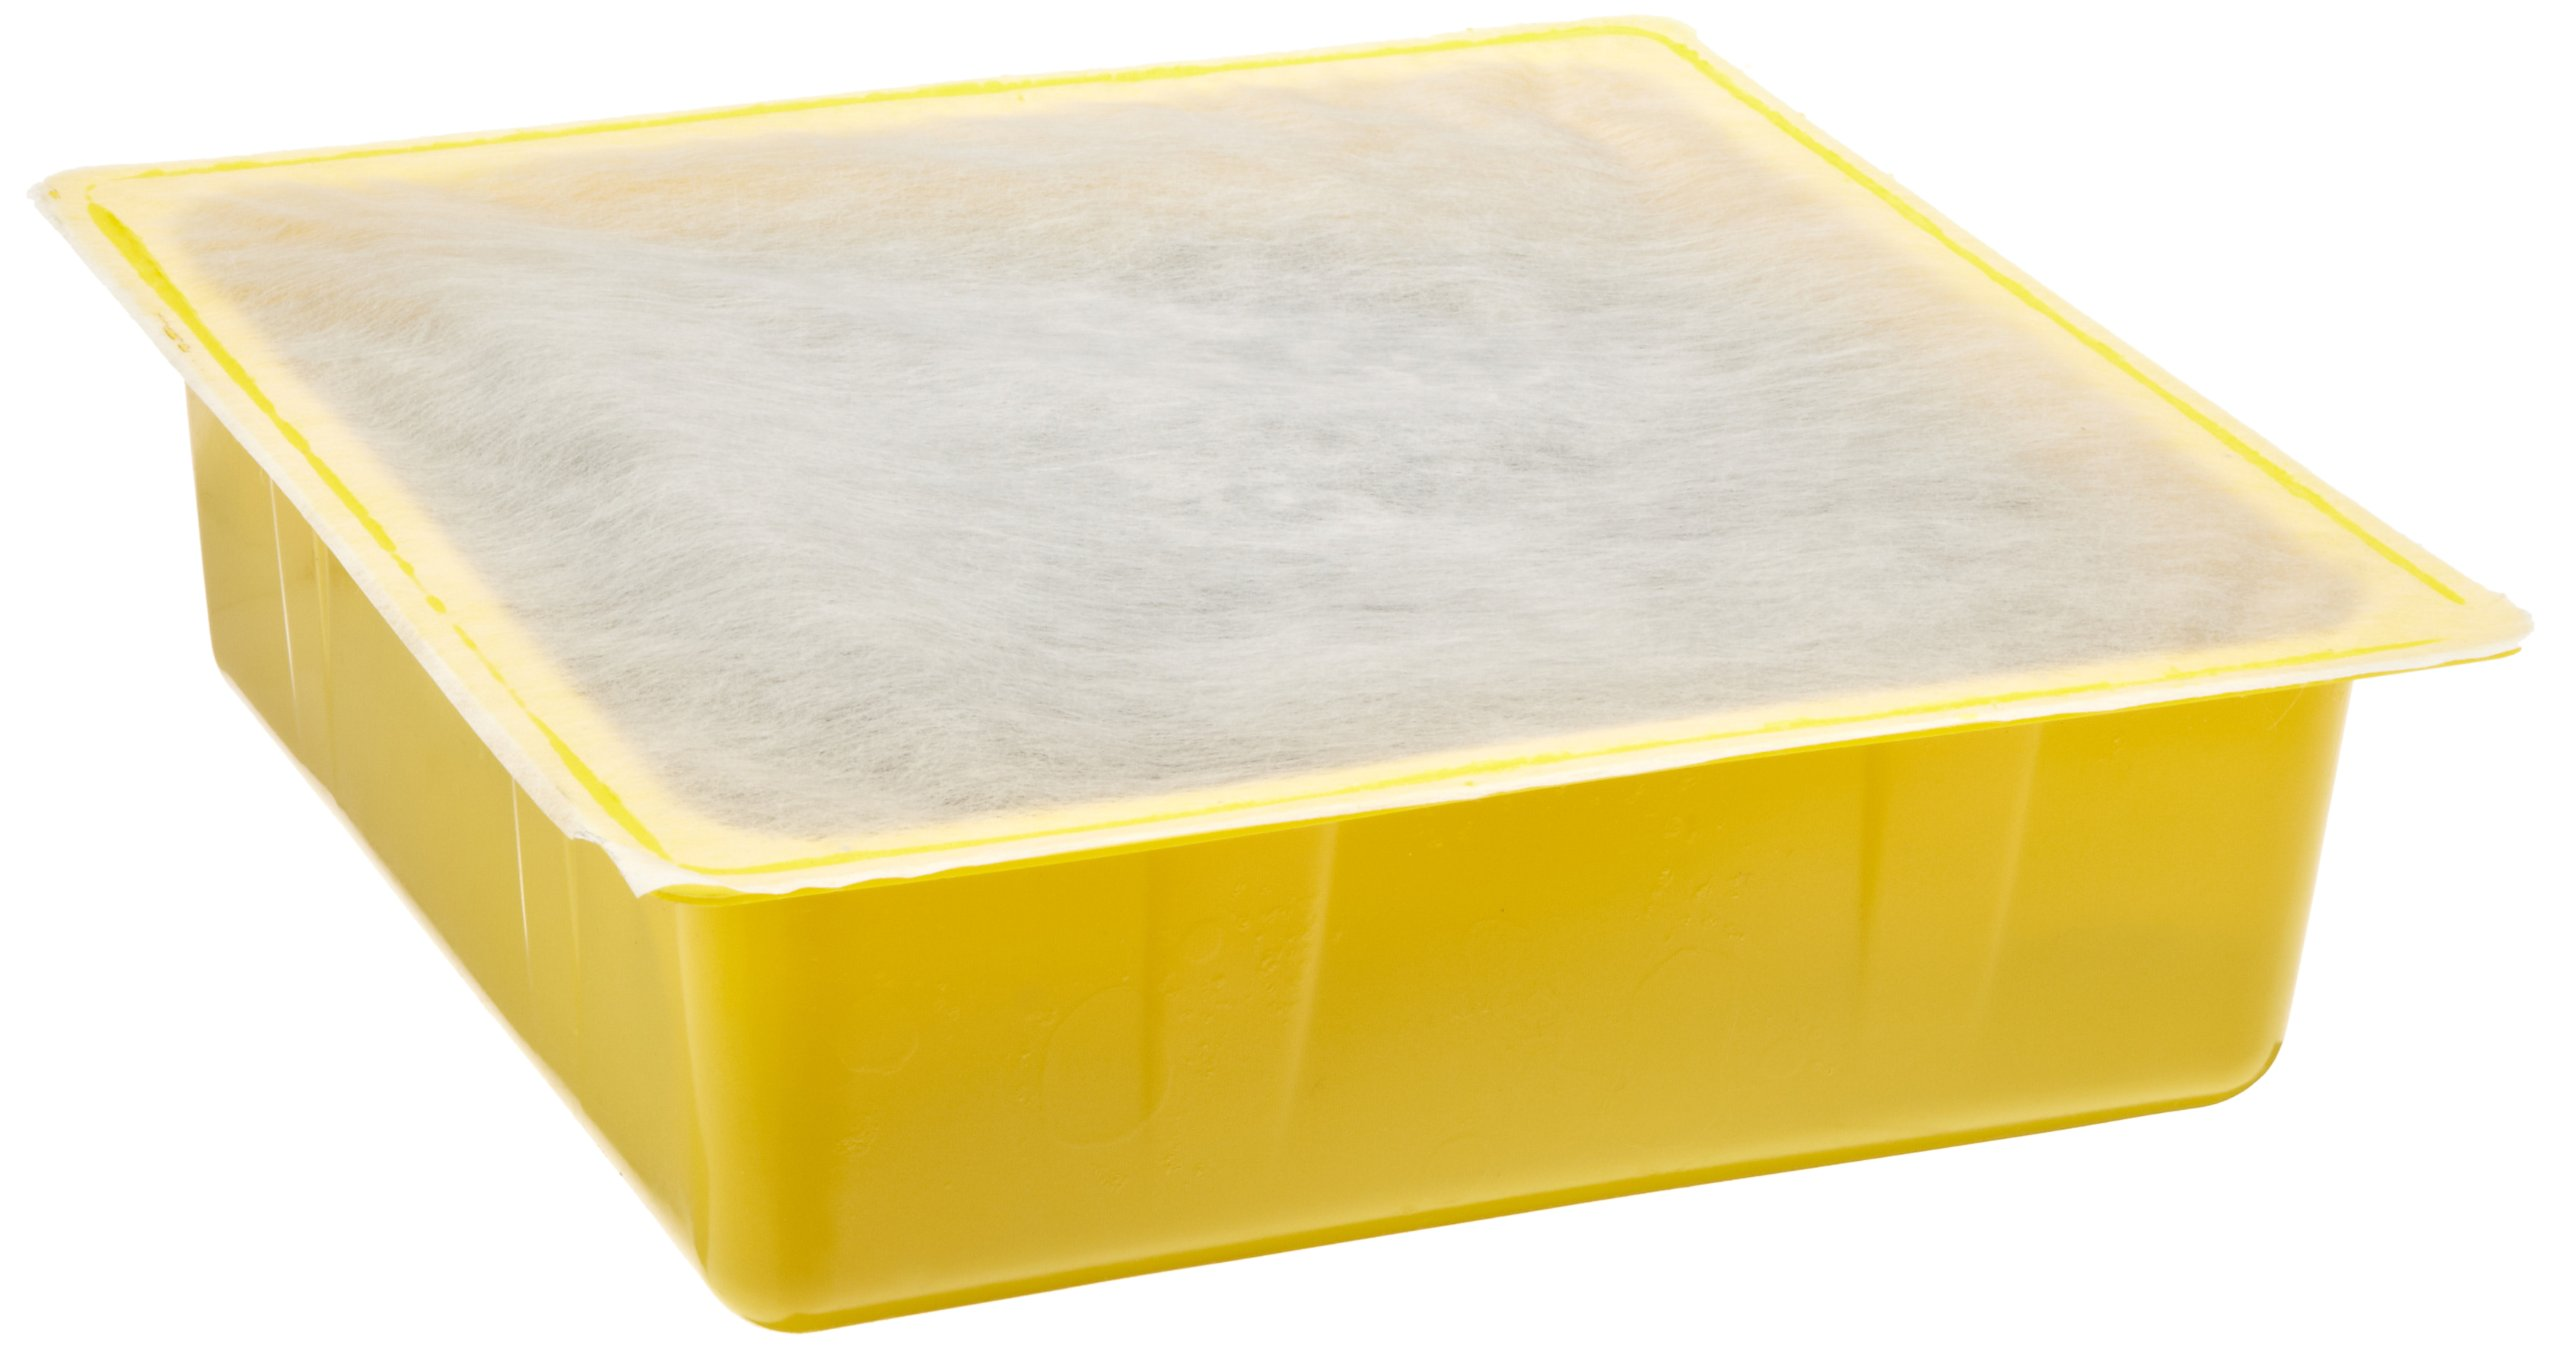 Eagle 1670 Polyethylene Drip Pan, 10-1/2'' ID x 10-1/2'' OD x 3'' Height, Yellow (Case of 12)